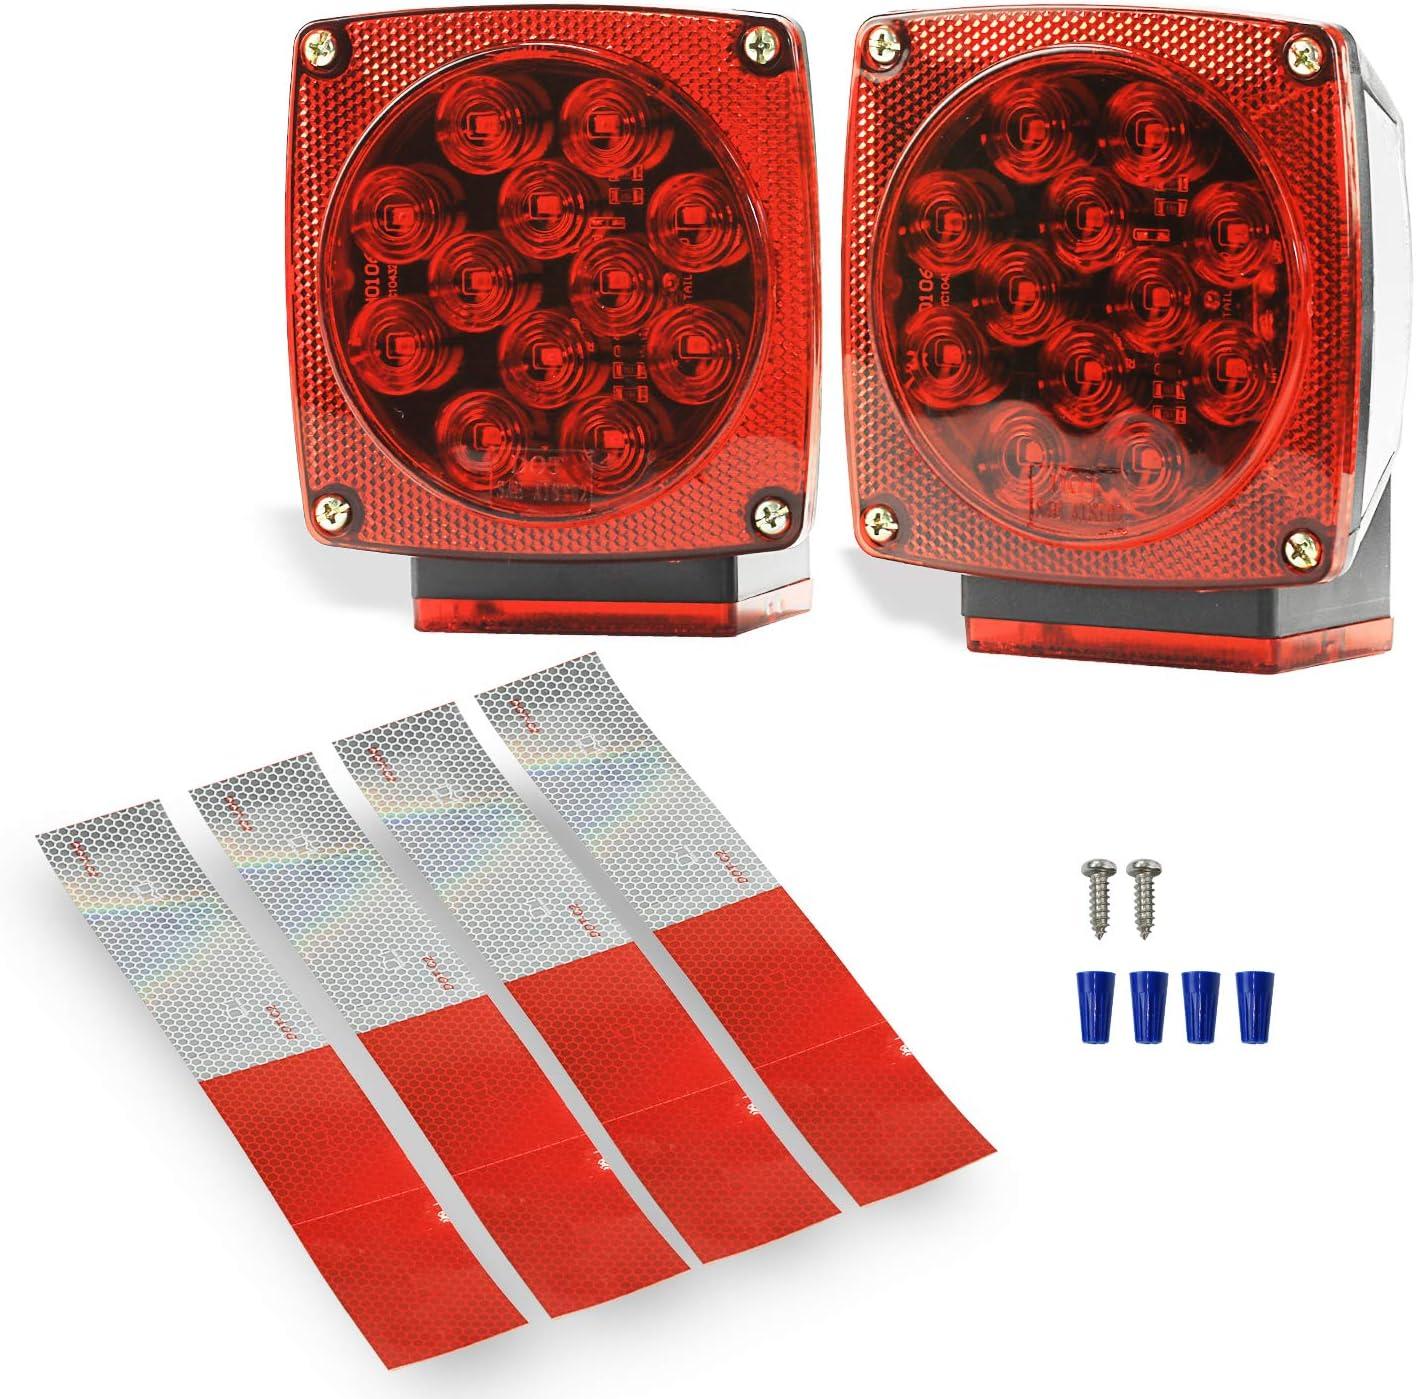 Wellmax LED Trailer Lights 12V Utility Marine Trailer Light Waterproof and DOT Approved Led Boat Trailer Lights Submersible